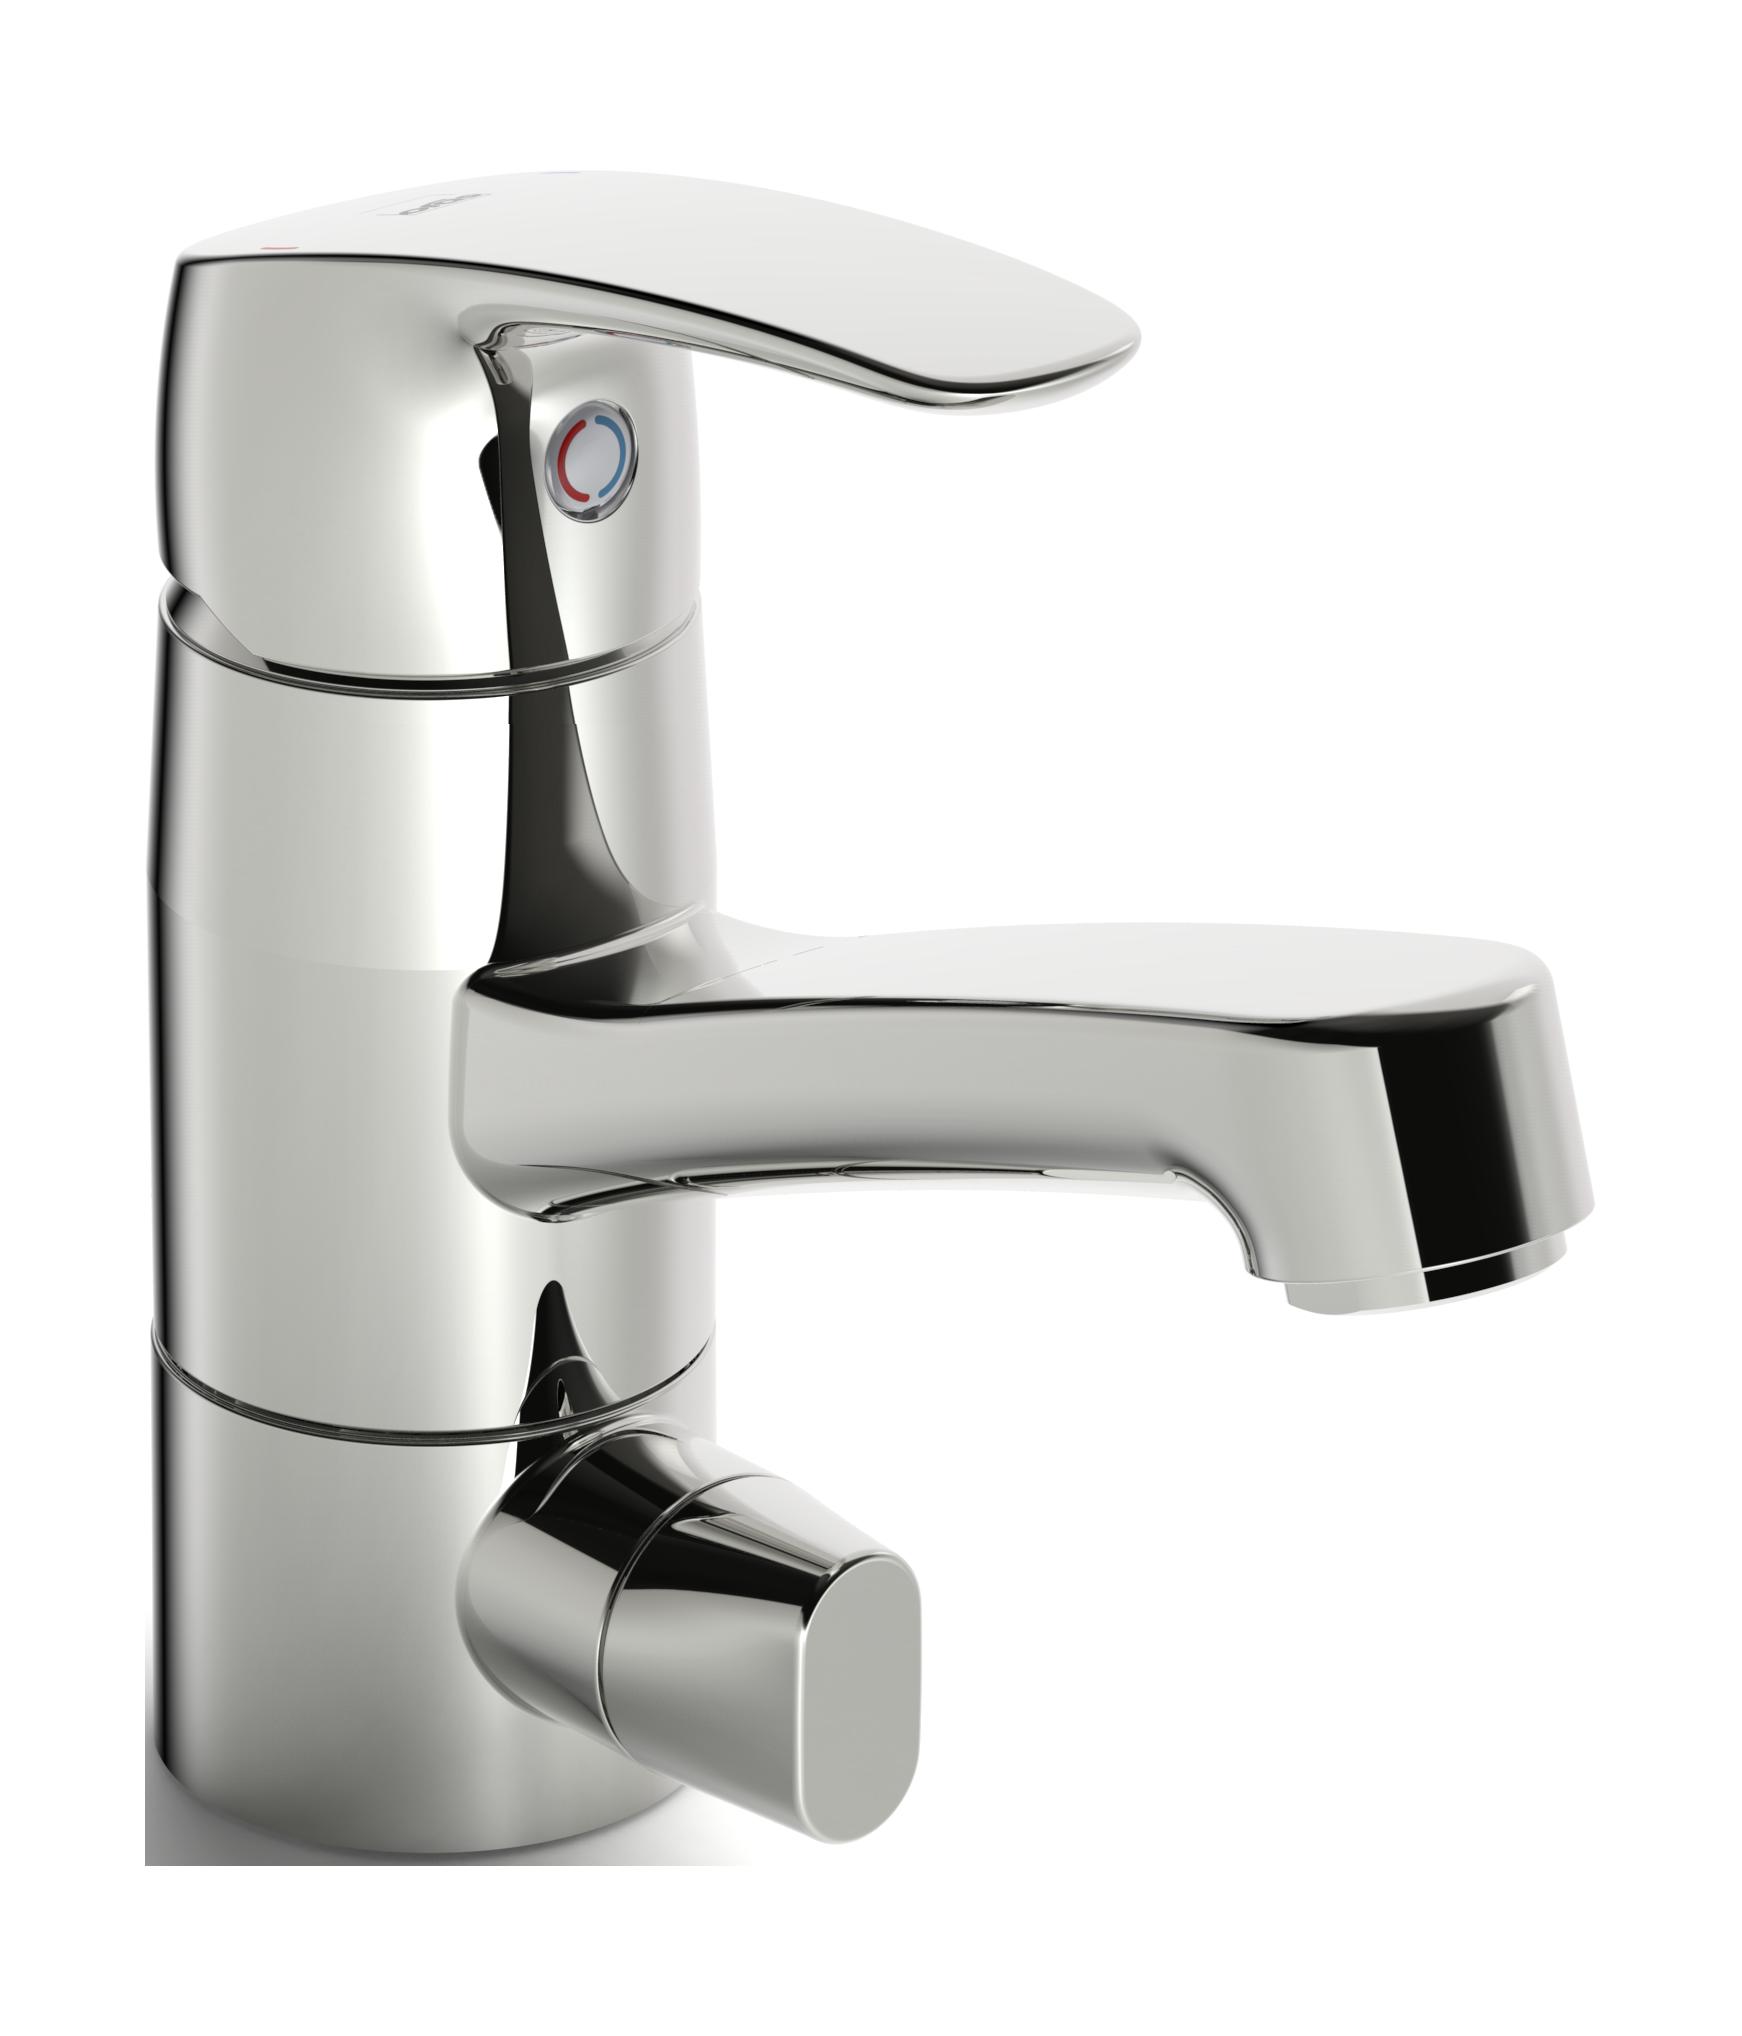 Faucet clipart water valve. Oras safira tap kitchen